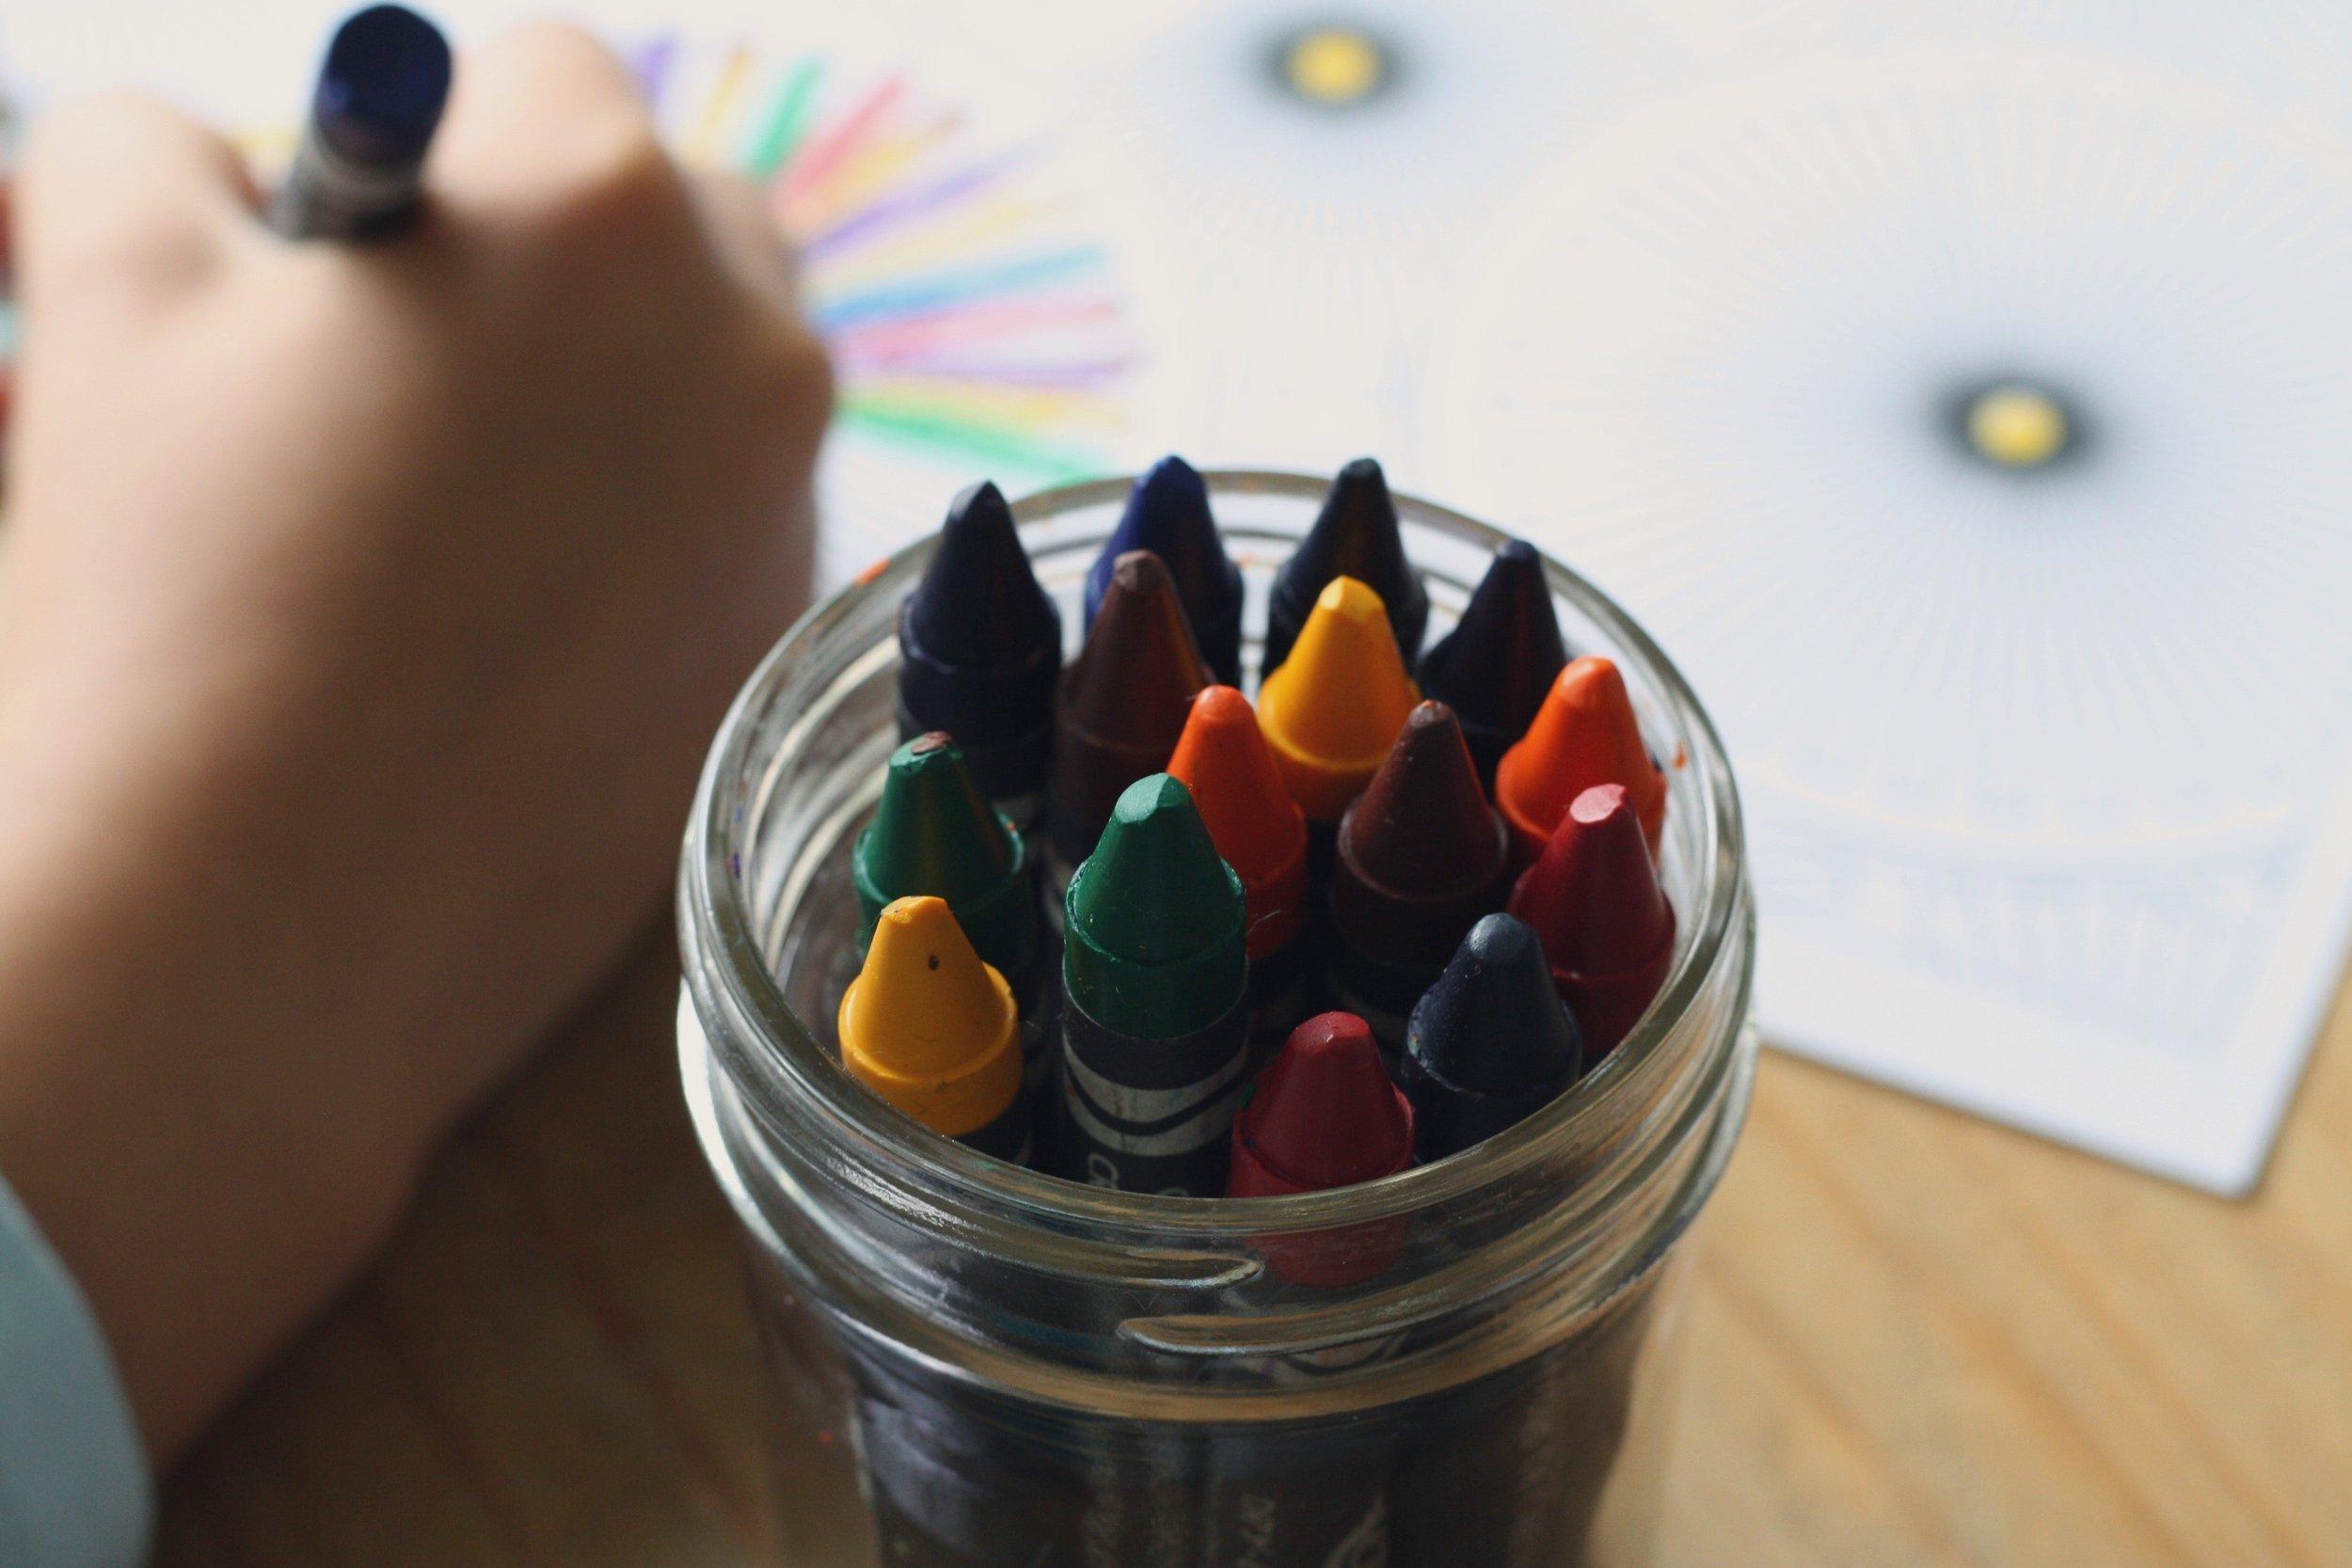 art-child-colorful-159570.jpg